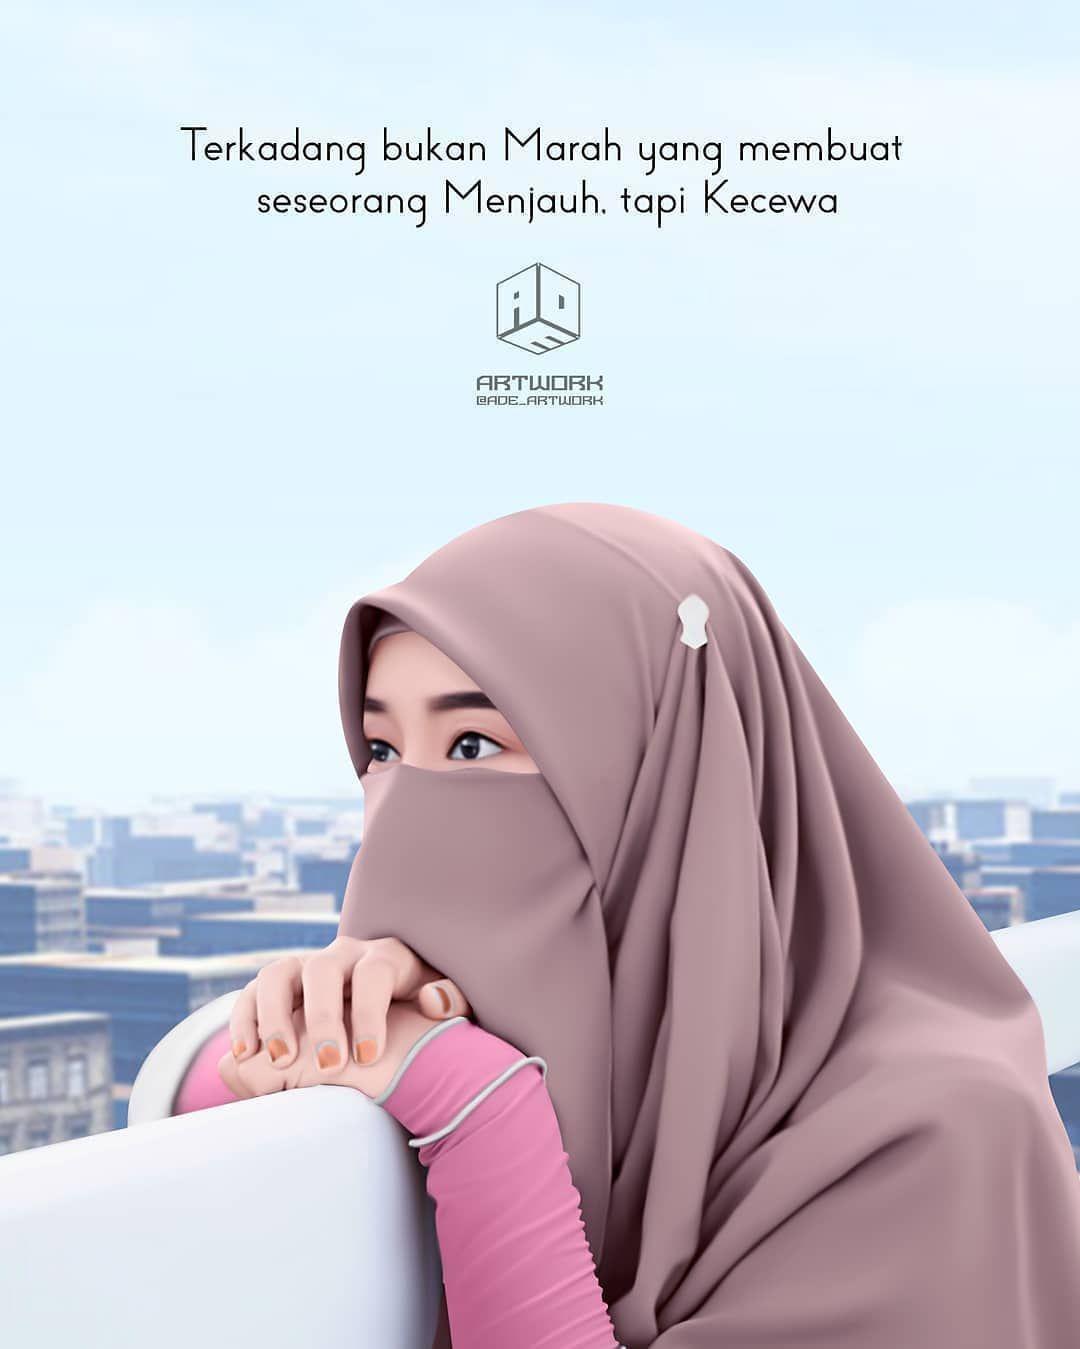 Foto Kartun Muslimah 3 Bersahabat Gambar Kartun Kecantikan